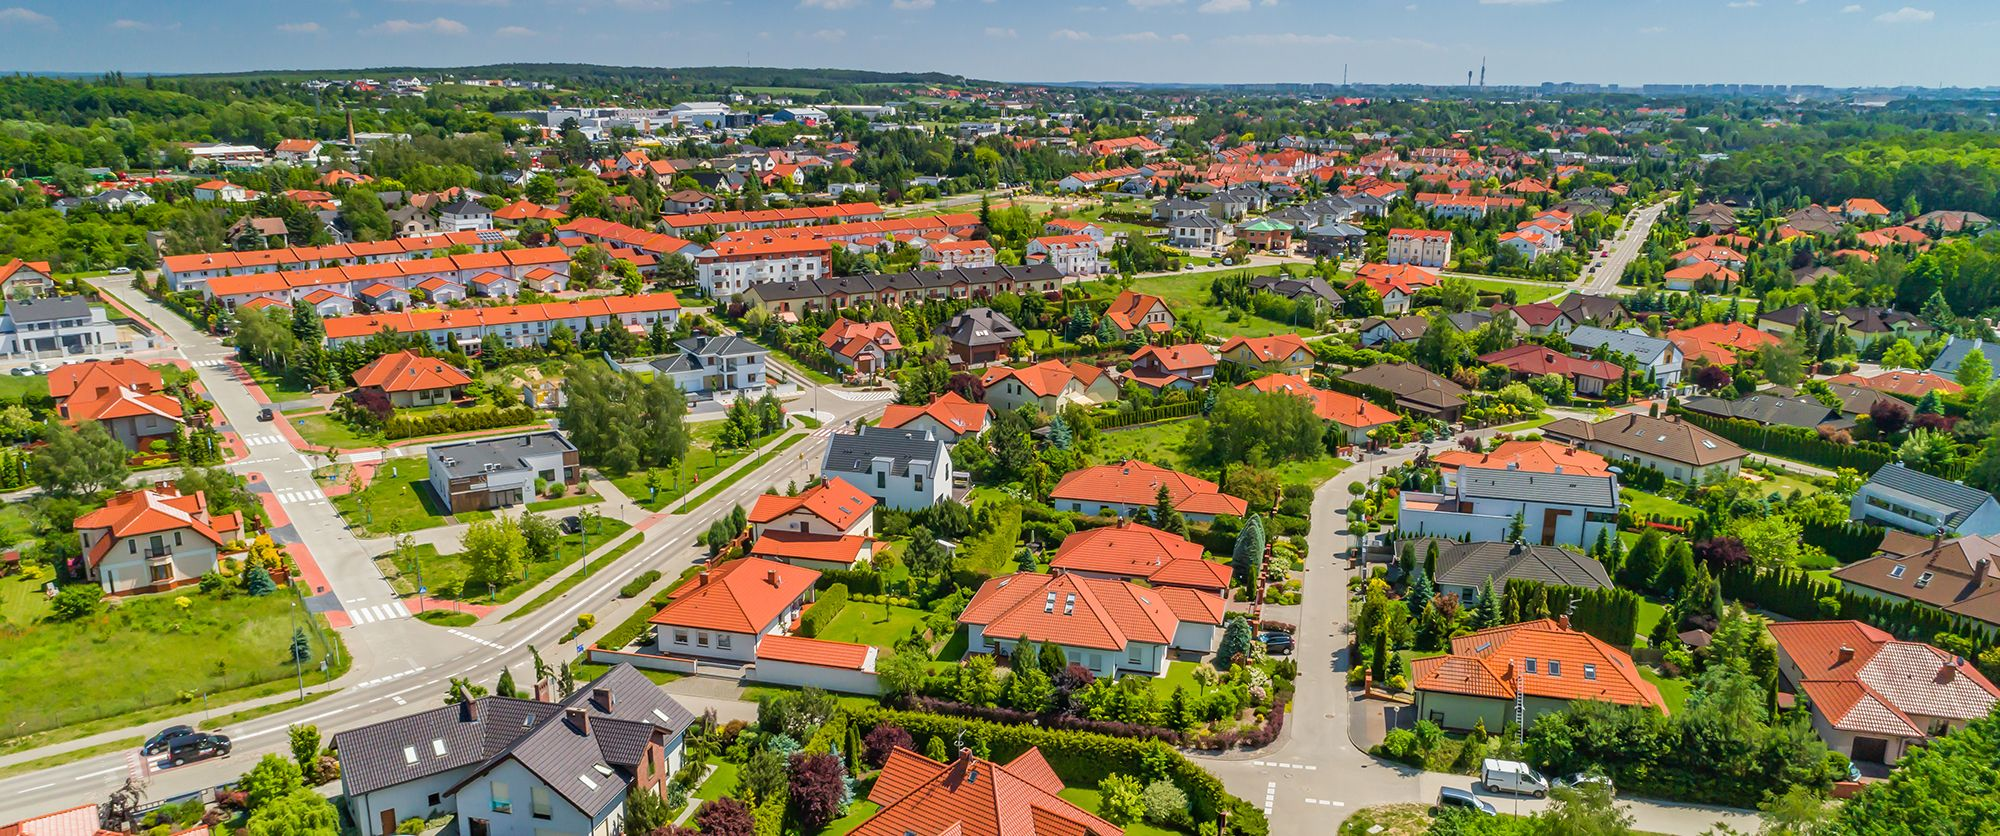 Sesje-fotograficzne-miast-gmin-i-regionow-Impatientstudio.pl2_